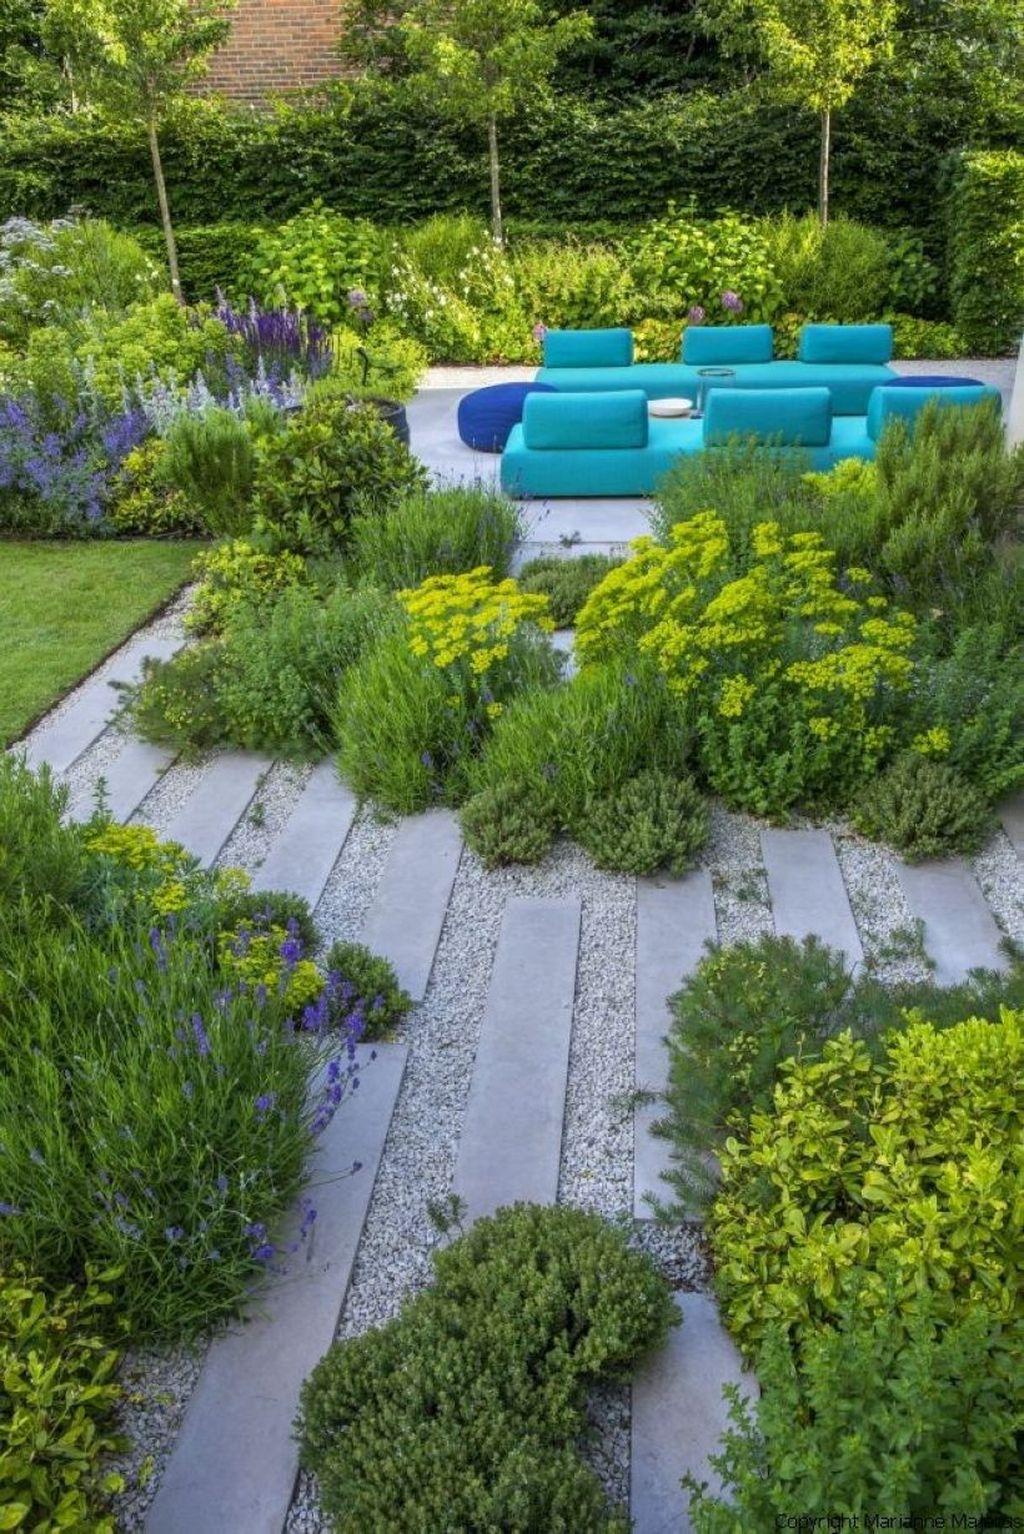 The Best Urban Garden Design Ideas For Your Backyard 23